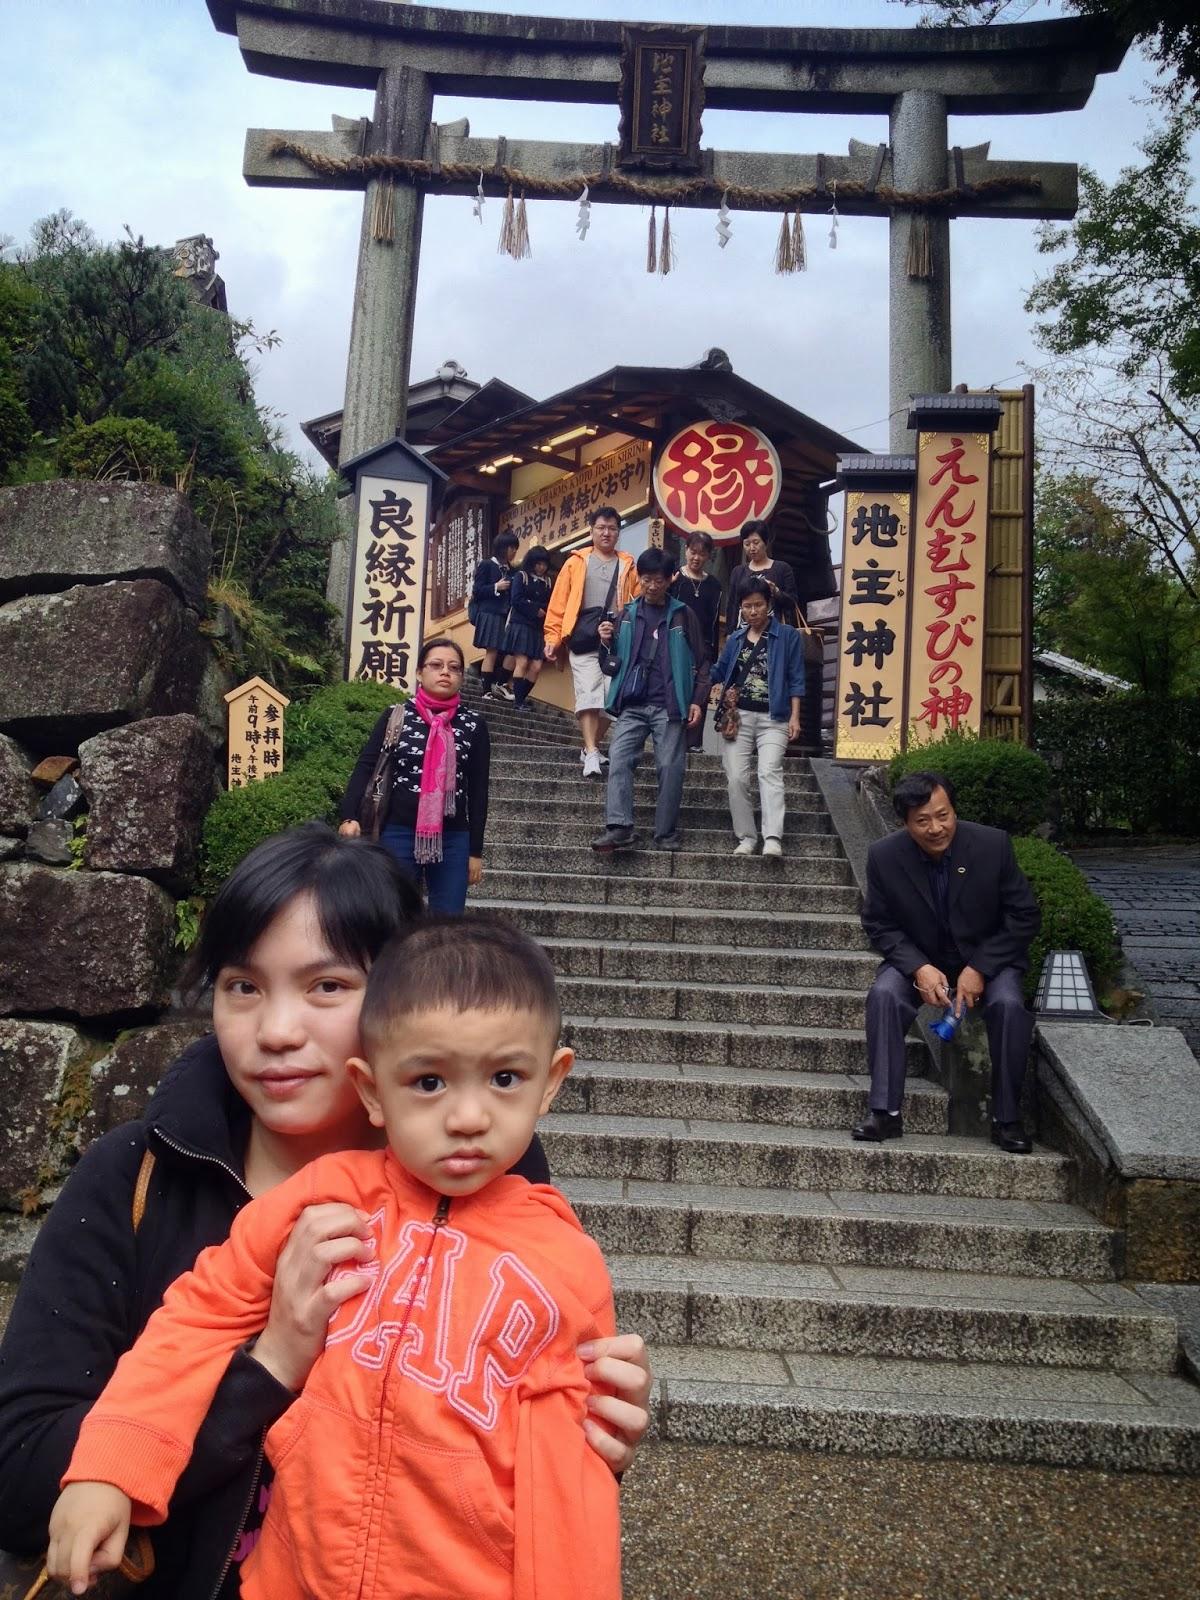 max's blog: 2013日本關西自駕遊-和歌山-京都-大阪 8天遊